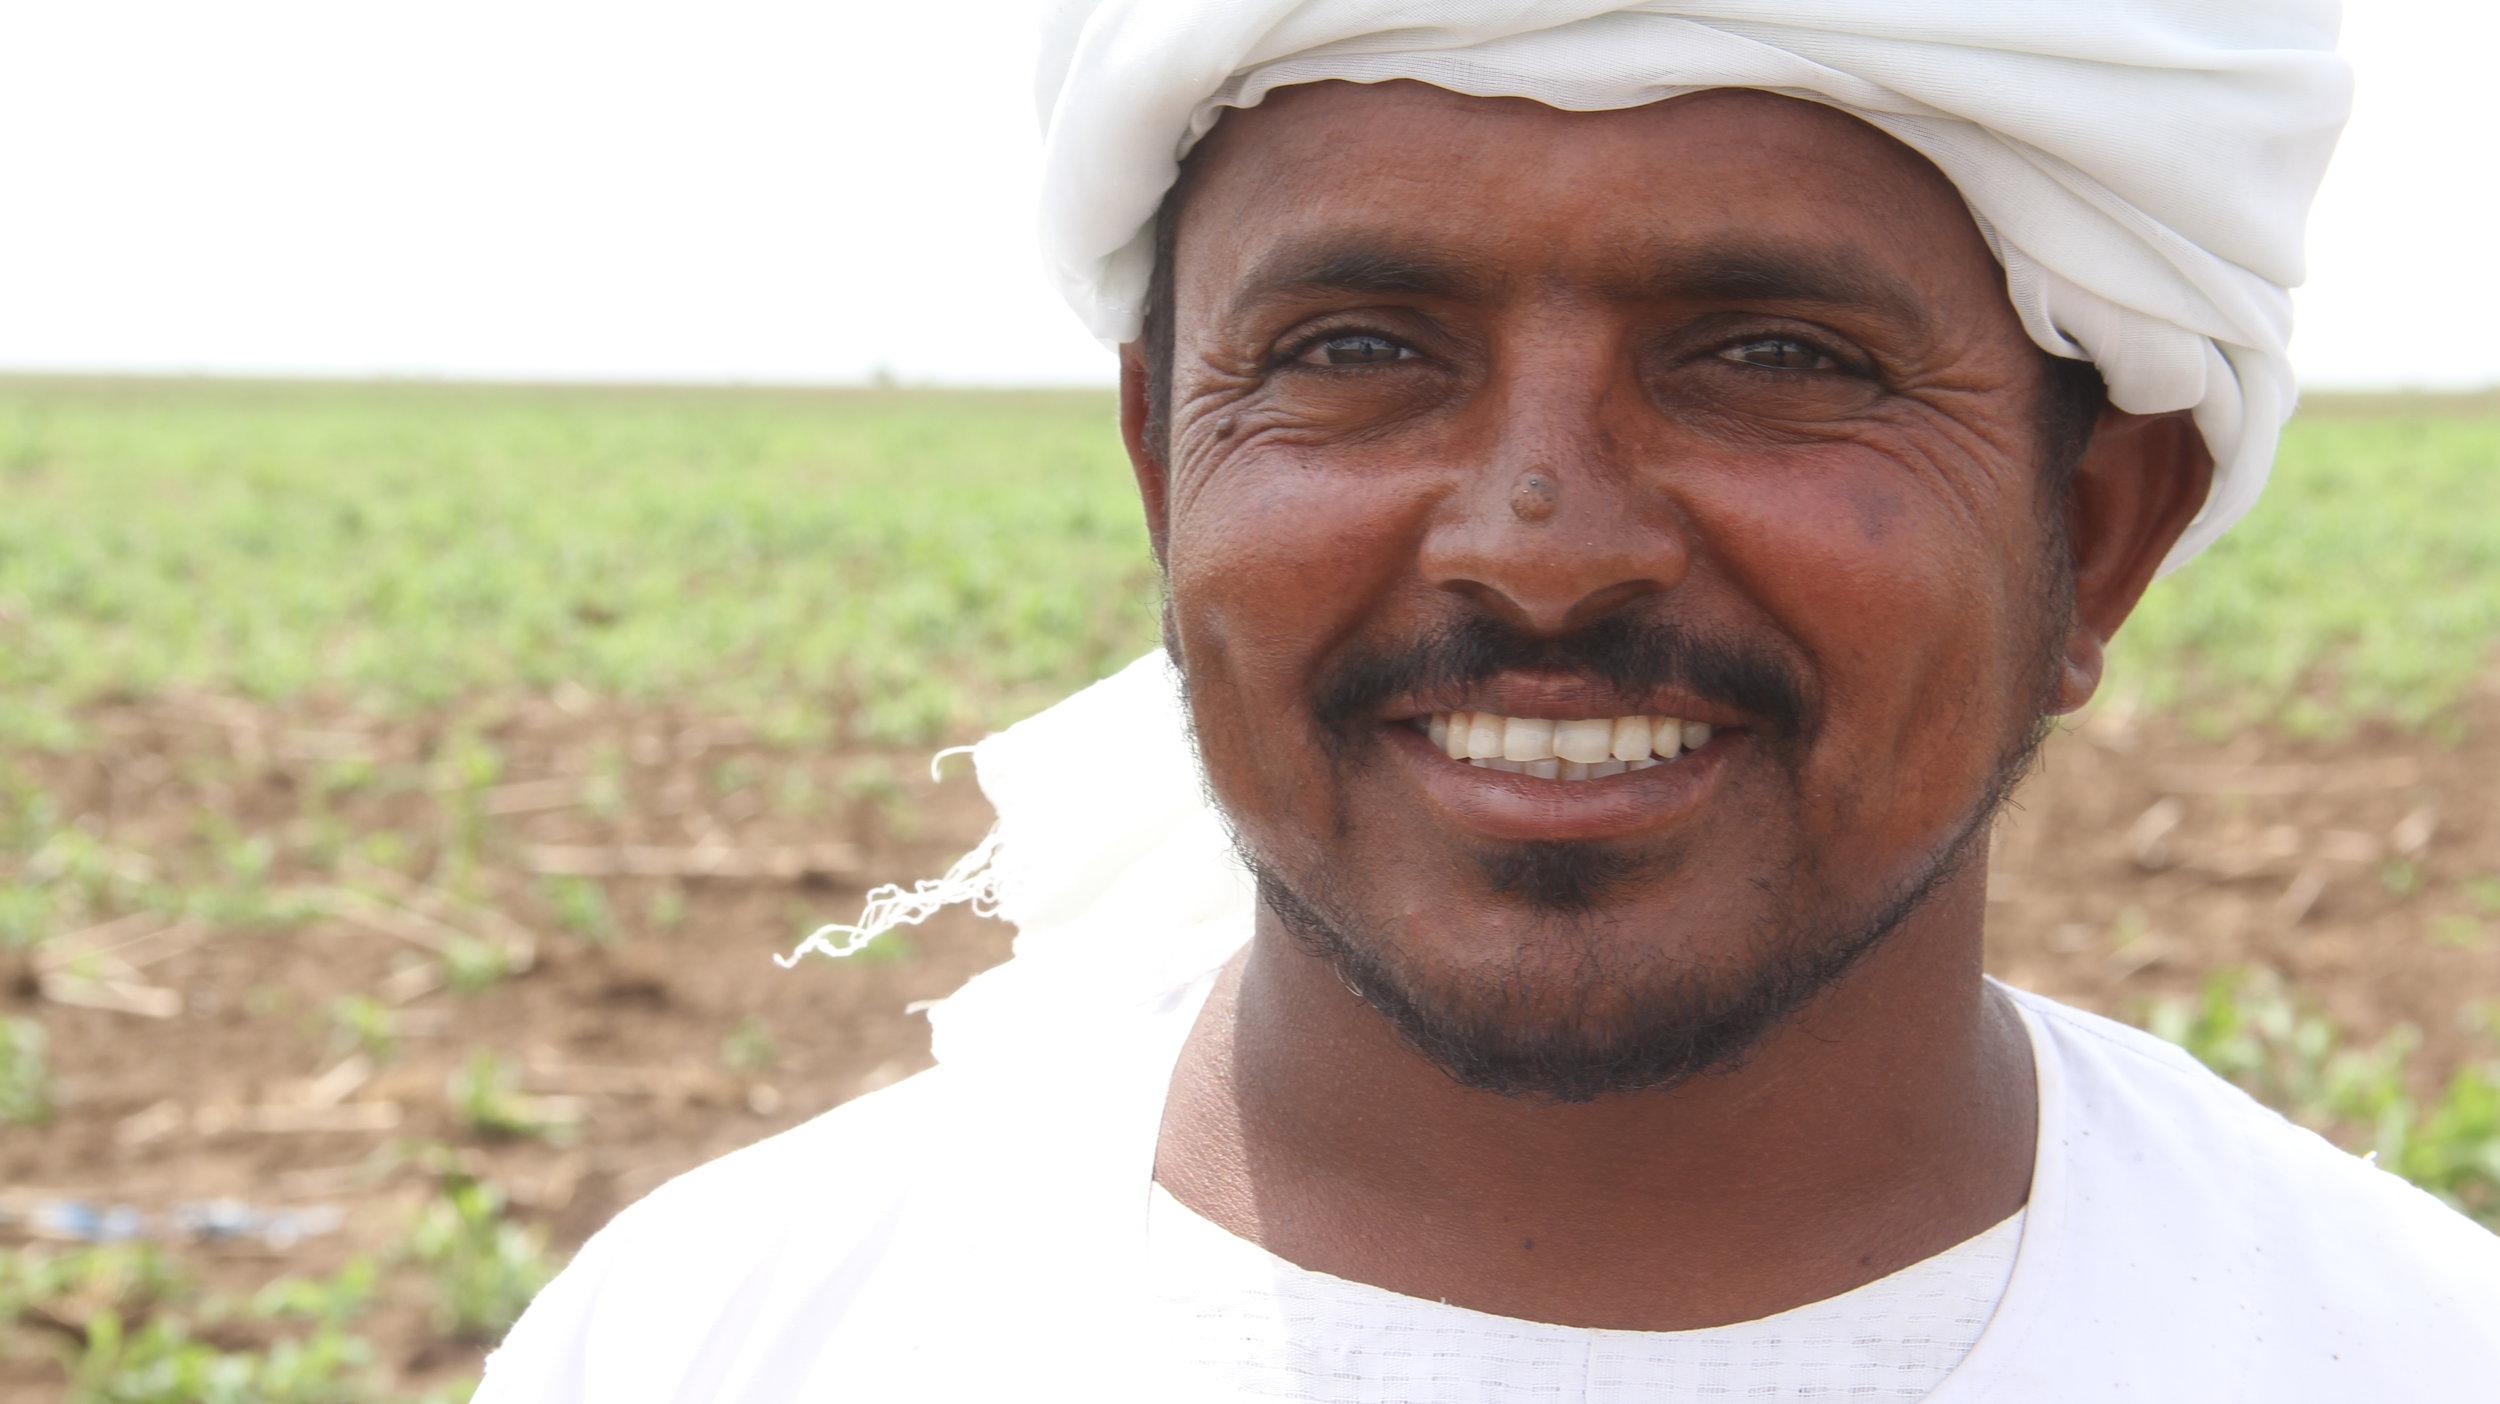 Farmer 35 years old WHH Al Alim village, Wad Elhilew, Kassala State